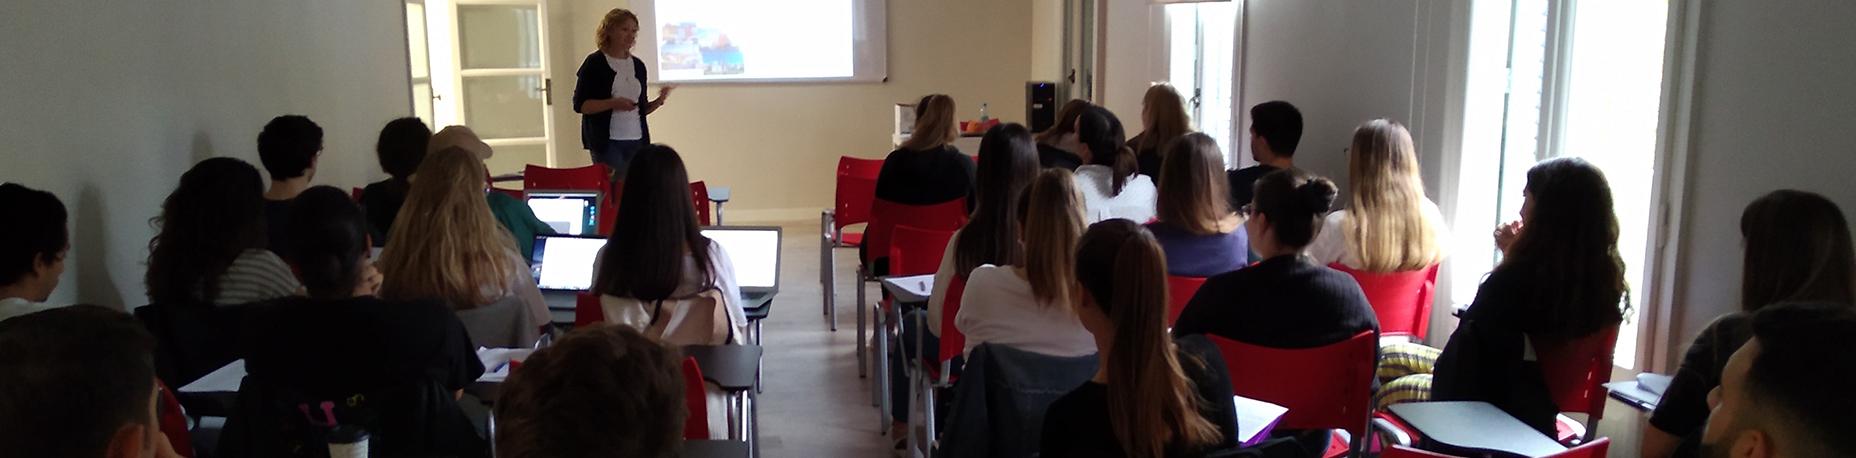 Visita Erasmus de la profesora Agnieska Knap-Stefaniuk | Escuela Universitaria Formatic Barcelona